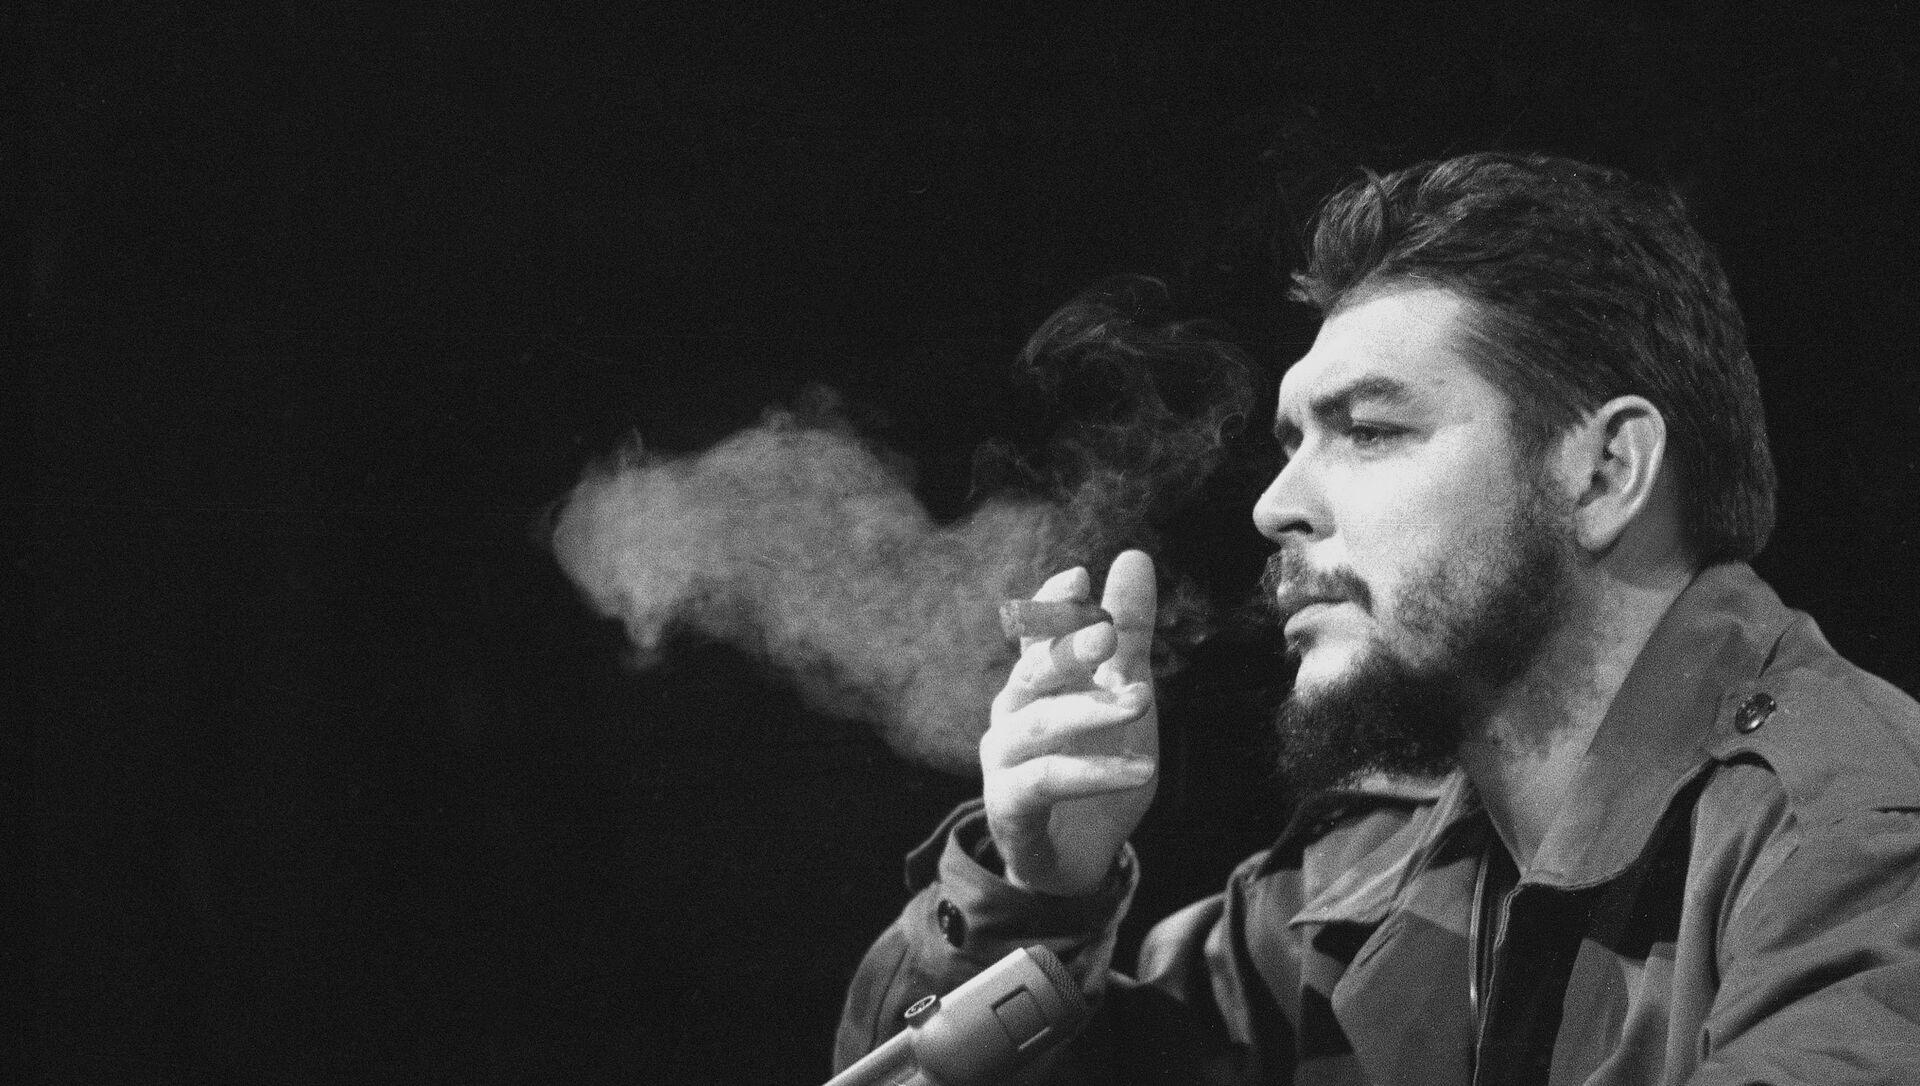 Latin American revolutionary Ernesto Che Guevara is seen in 1964. - Sputnik Mundo, 1920, 08.10.2020